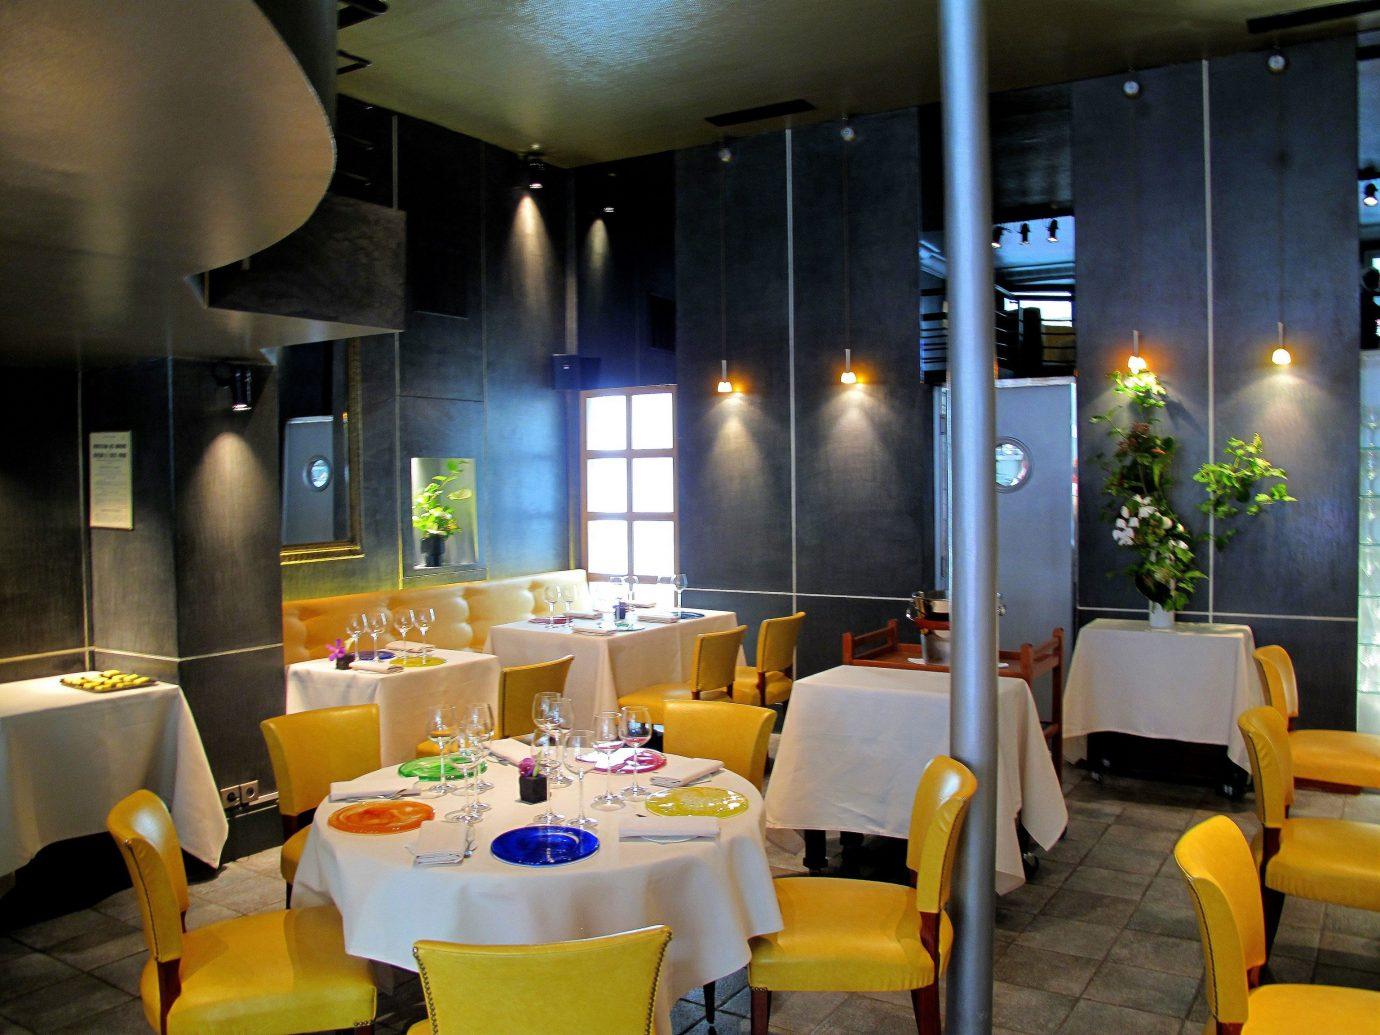 Food + Drink table indoor restaurant room ceiling interior design function hall meal lighting Lobby Design Bar